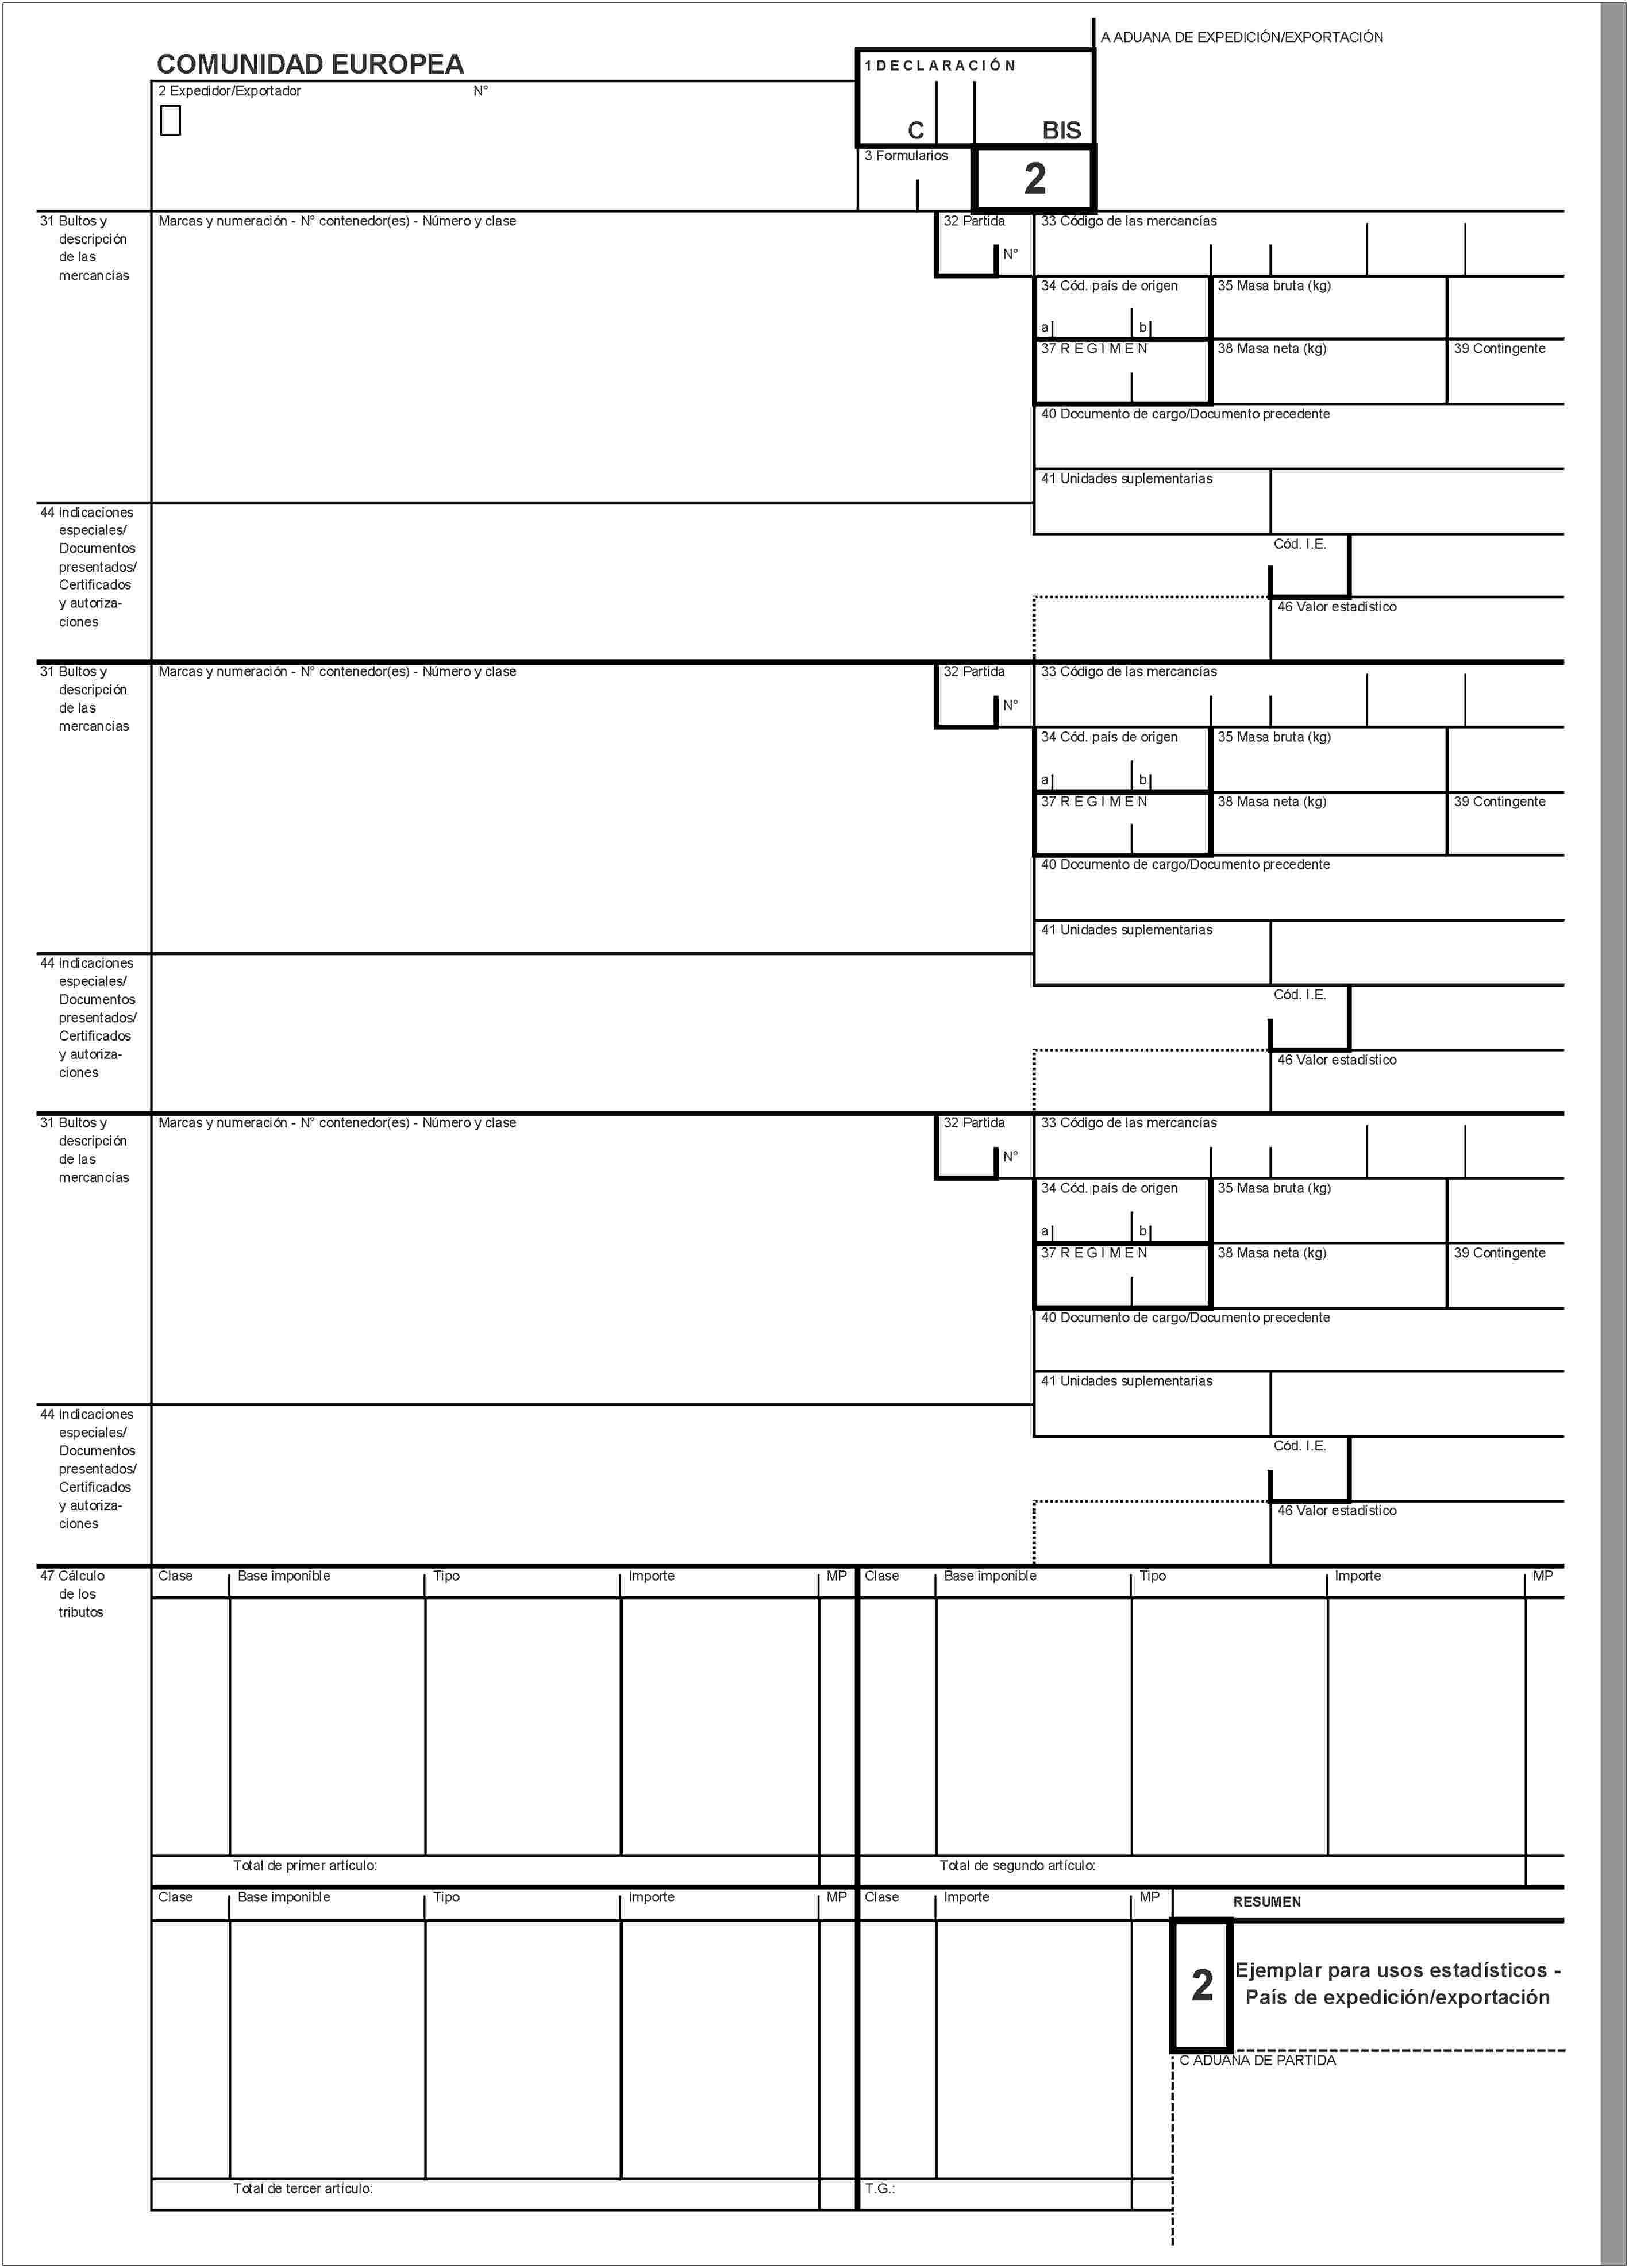 EUR-Lex - 01993R2454-20060601 - EN - EUR-Lex